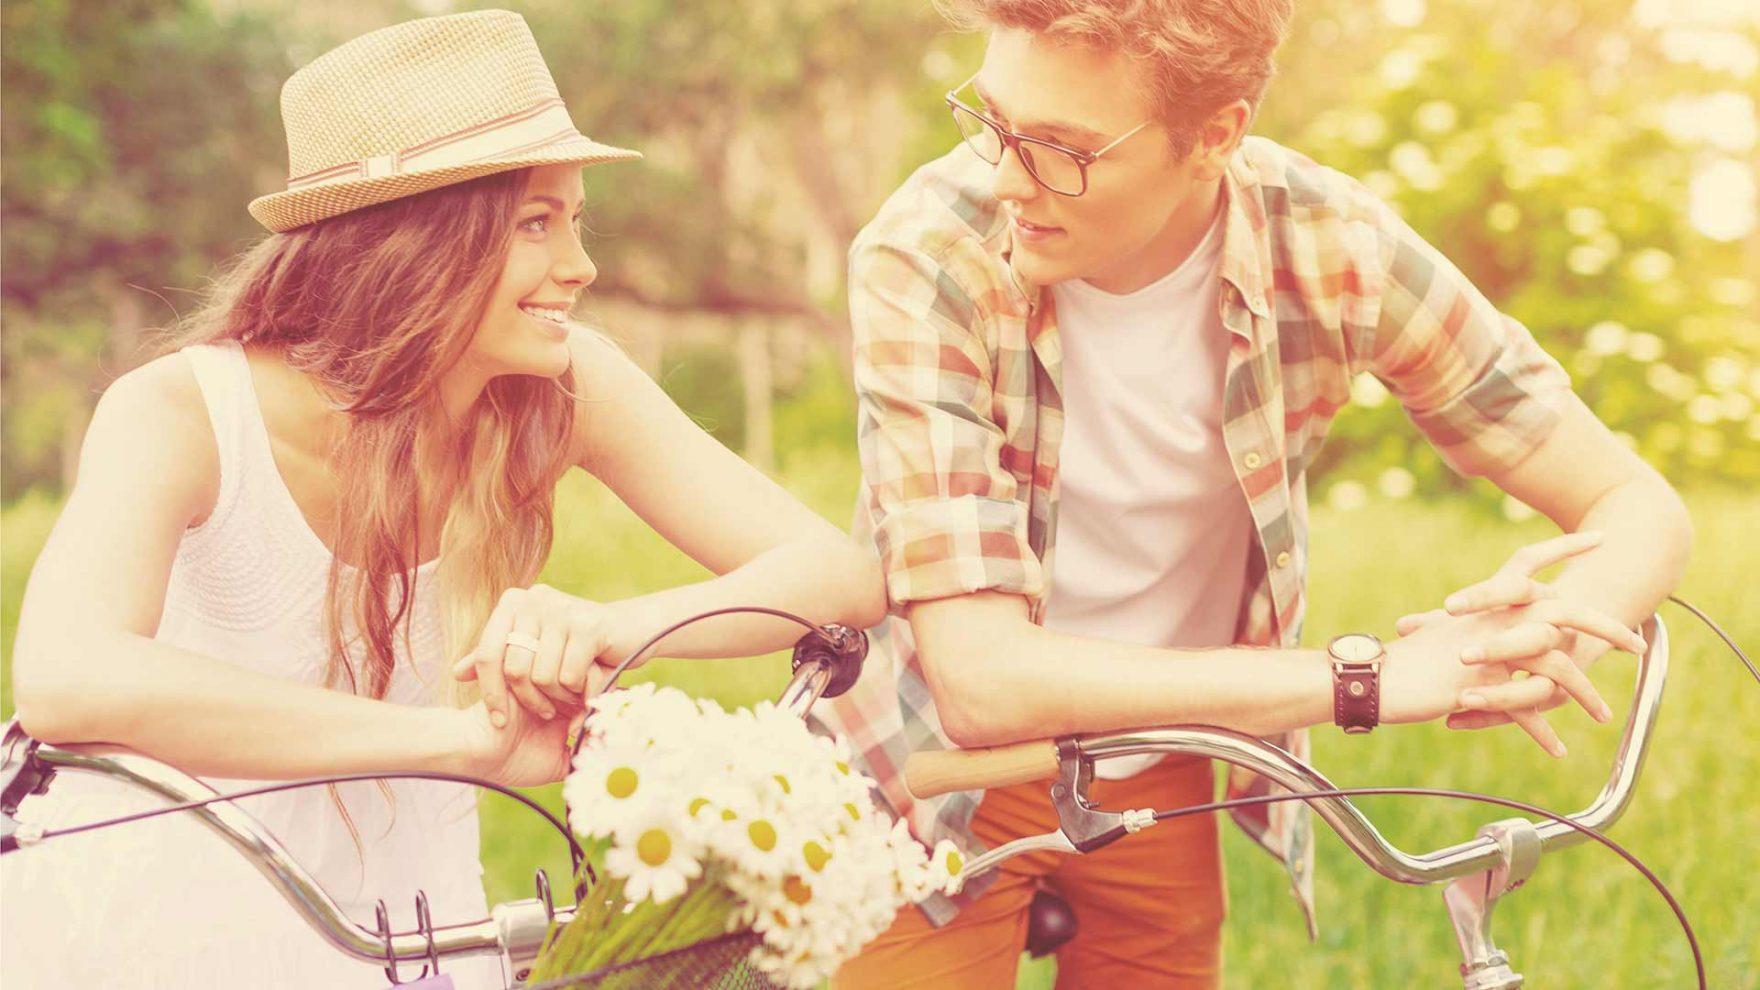 Primavera a Merano e dintorni - Vacanze in bici